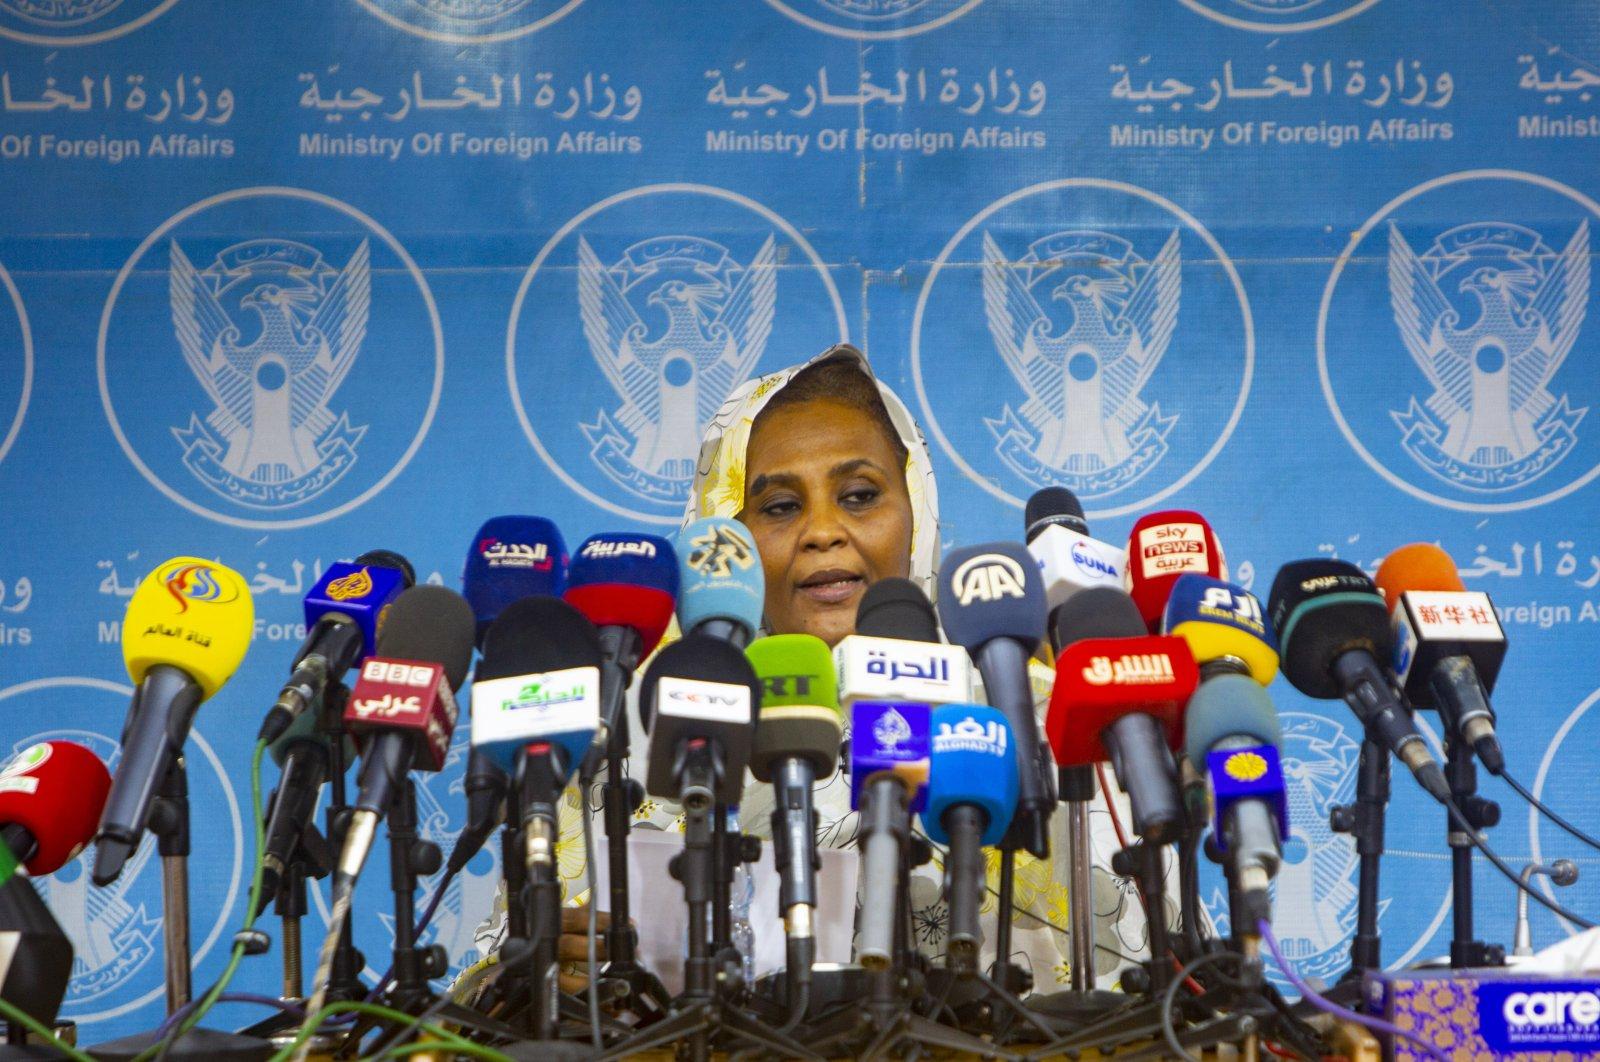 Sudanese Foreign Minister Mariam Al-Sadiq Al-Mahdi speaks at a news conference in Khartoum, Sudan, Sept. 18, 2021. (AA Photo)